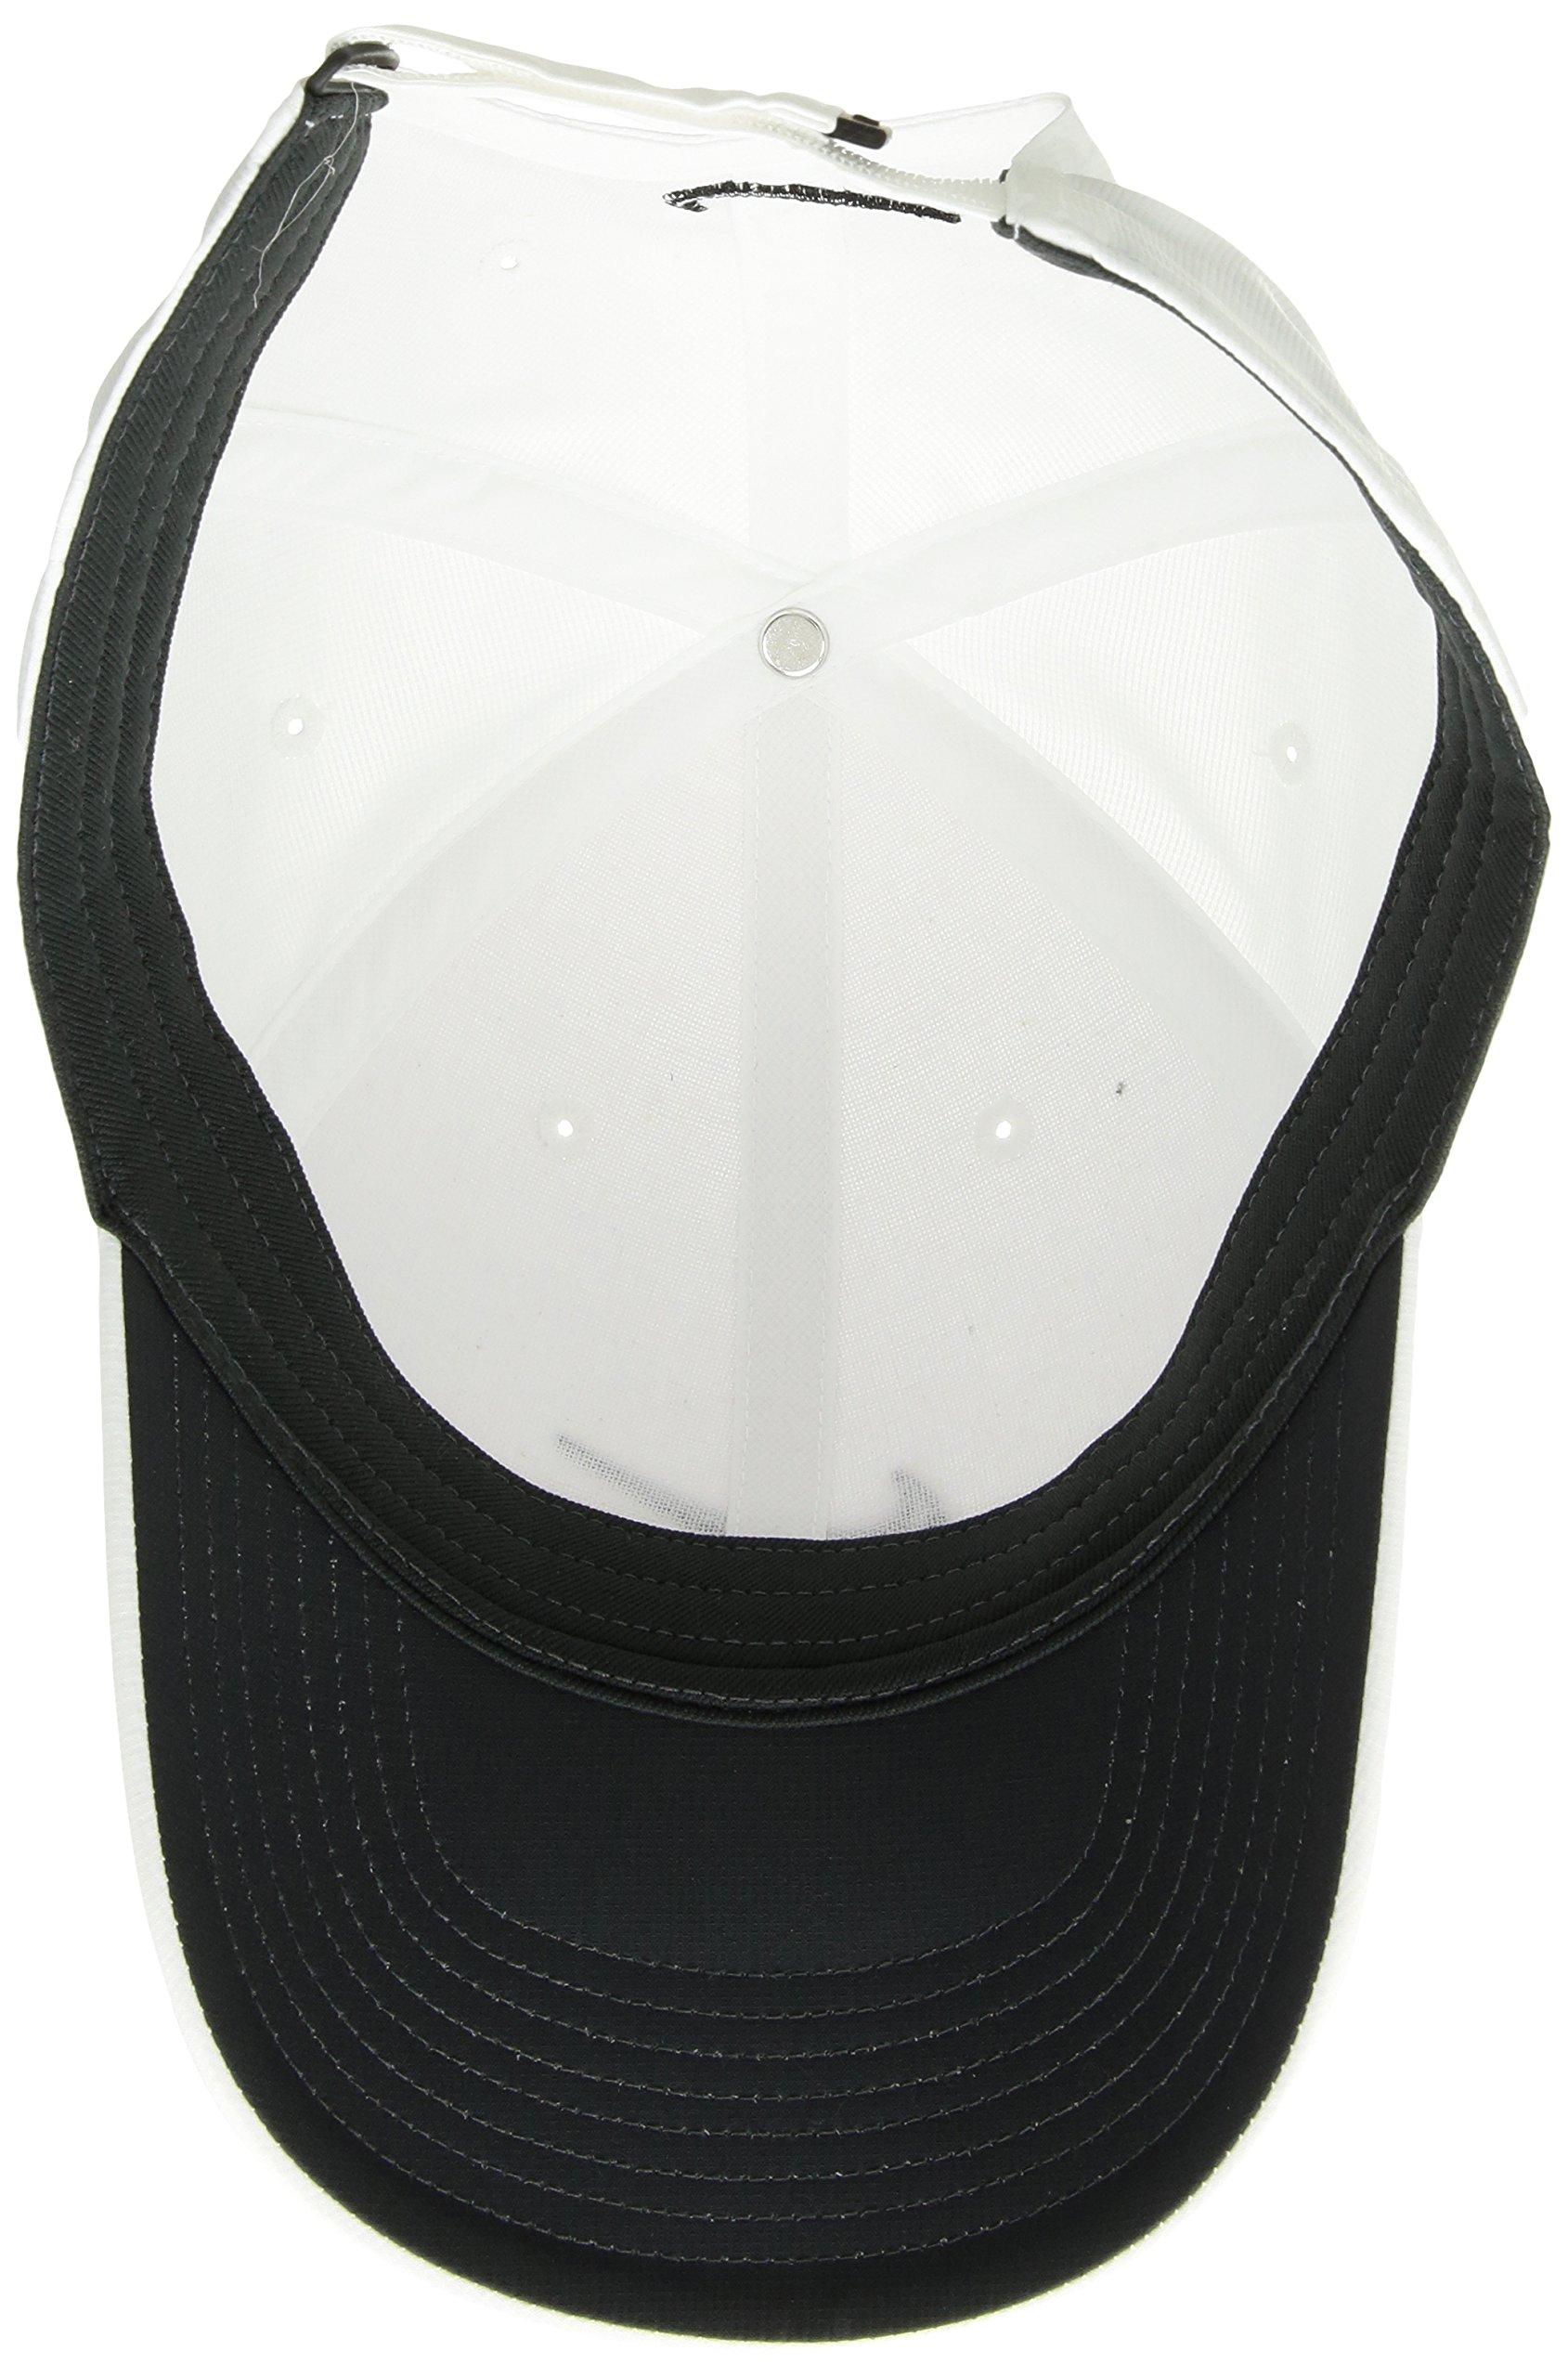 abaa8e04 ... amazon nike l91 cap tech hat white anthracite black misc 892651 100  misc hats caps sports